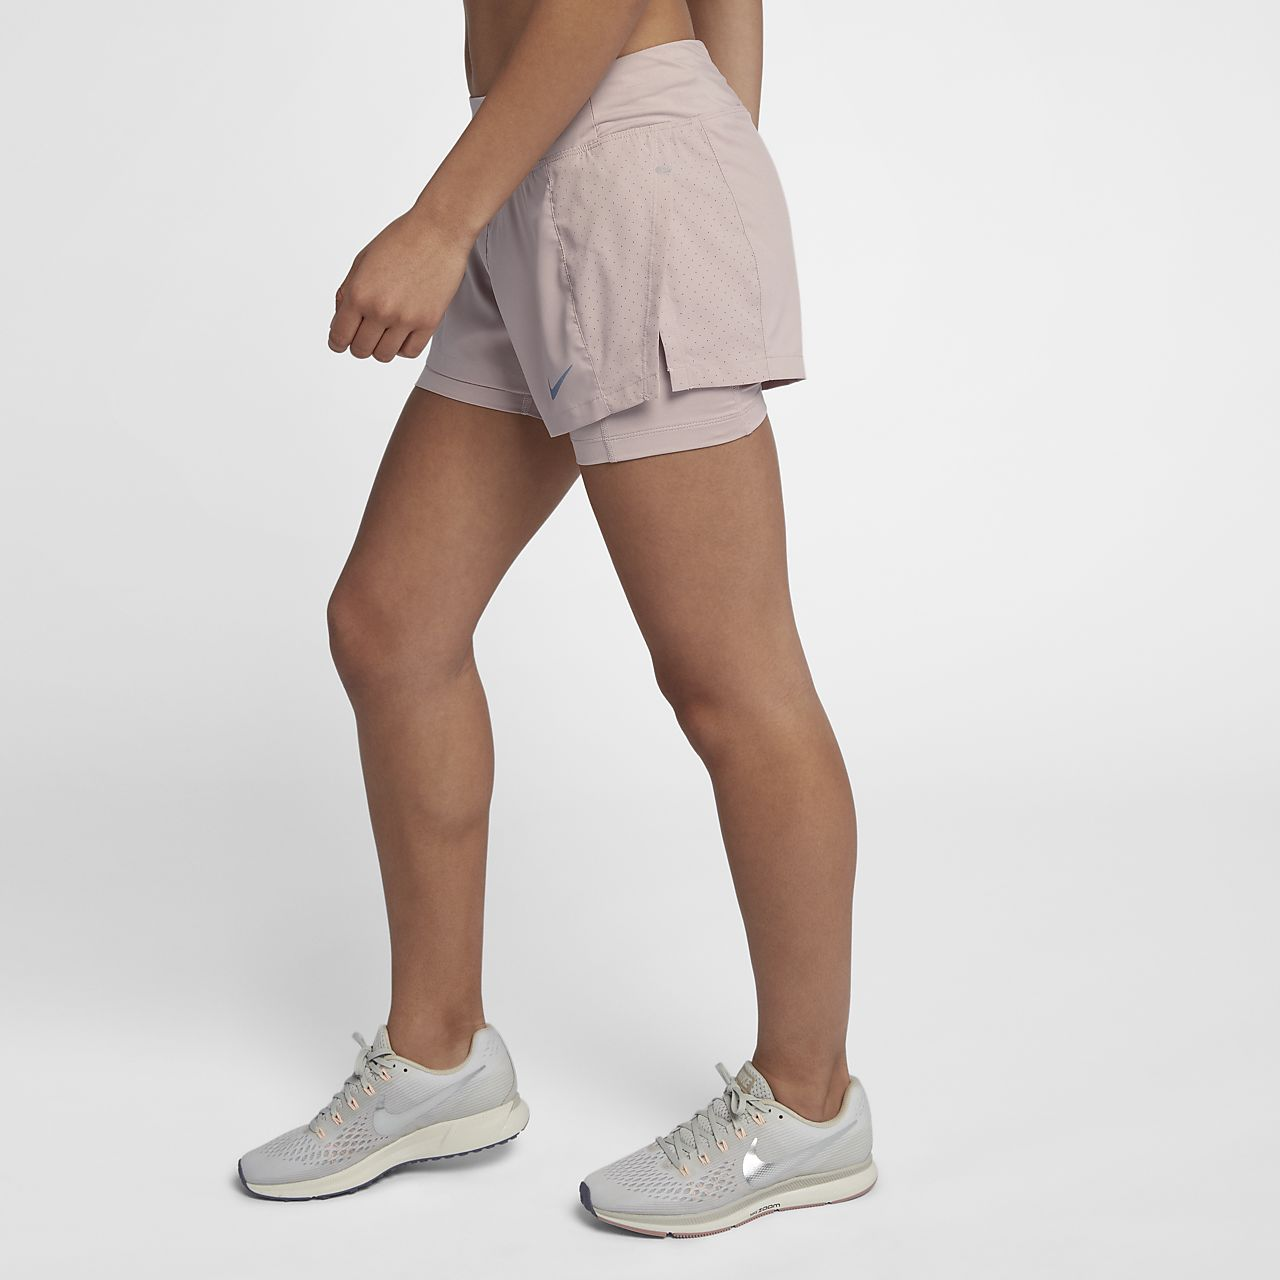 ... Nike Eclipse Women's 2-in-1 Running Shorts